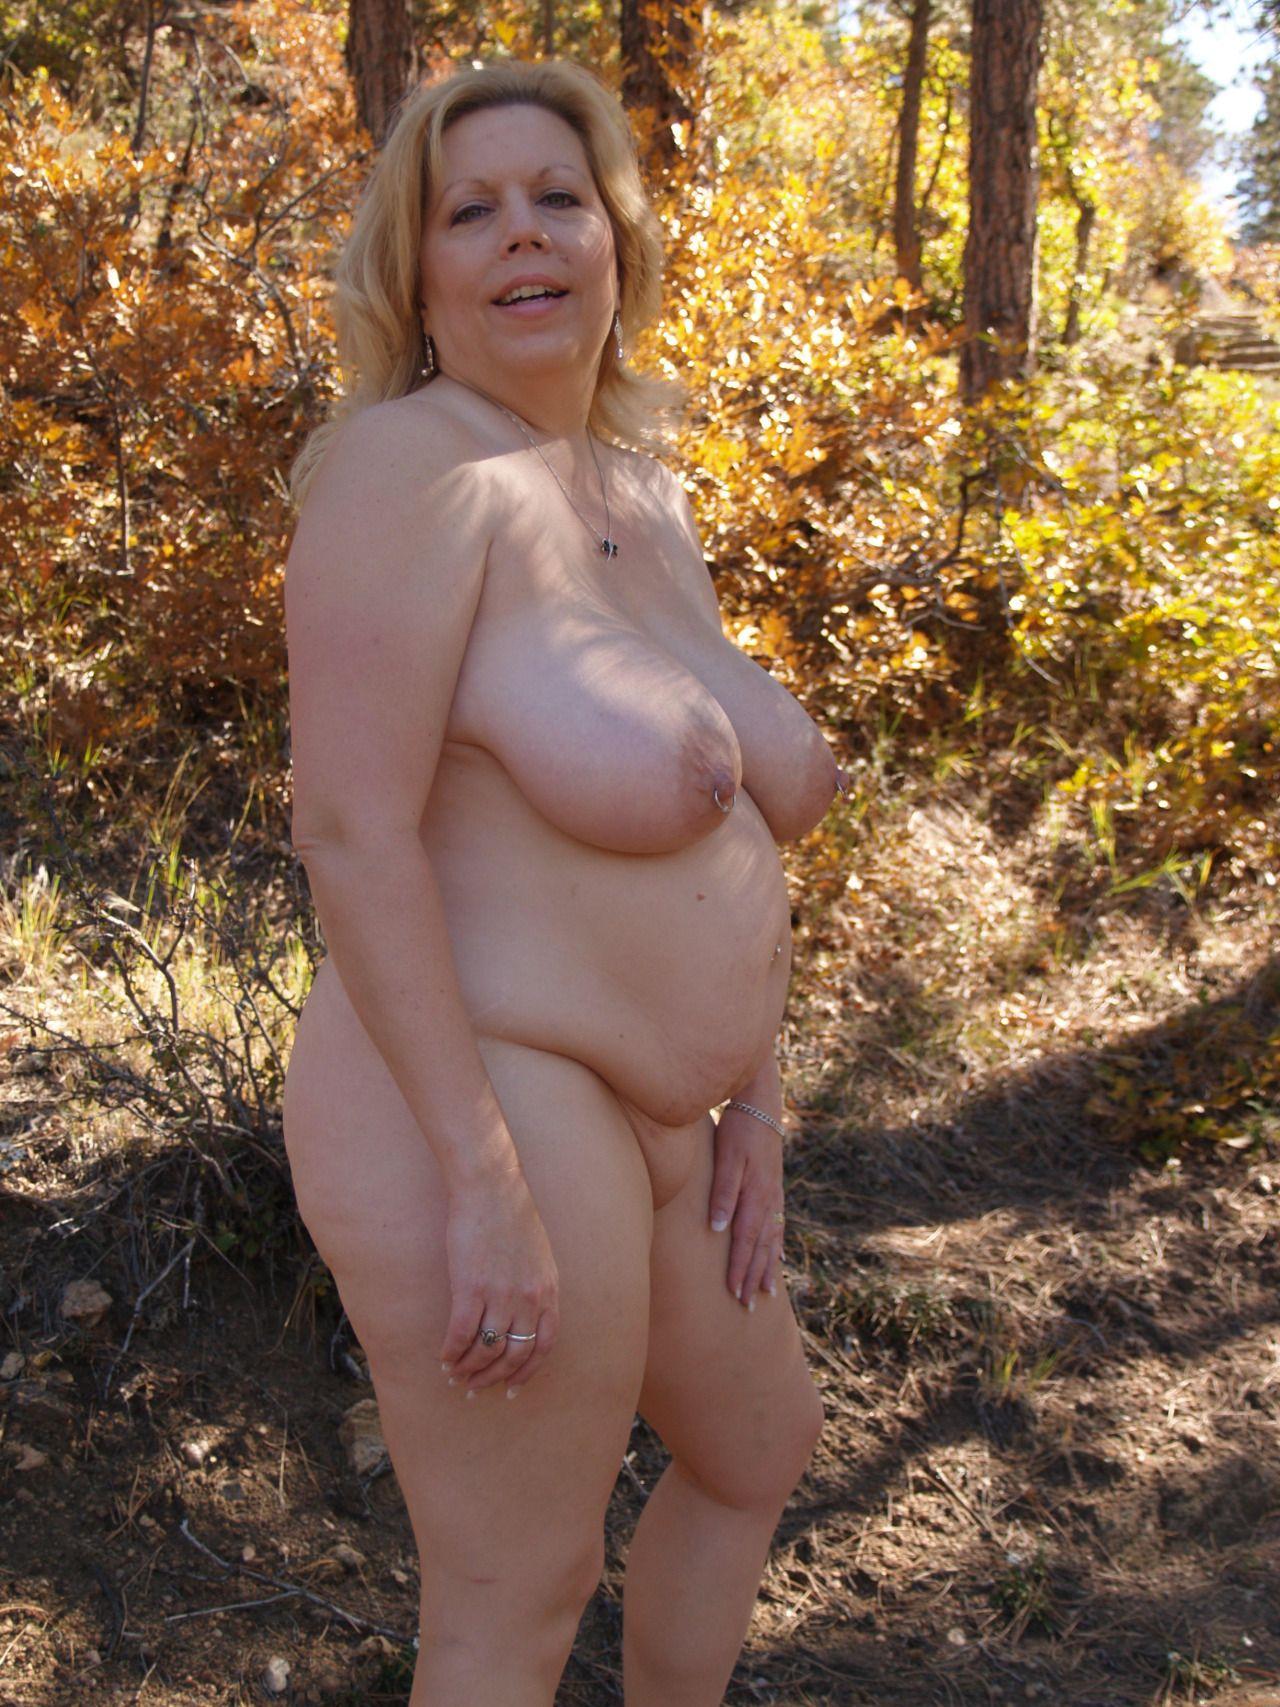 Big mature women nude